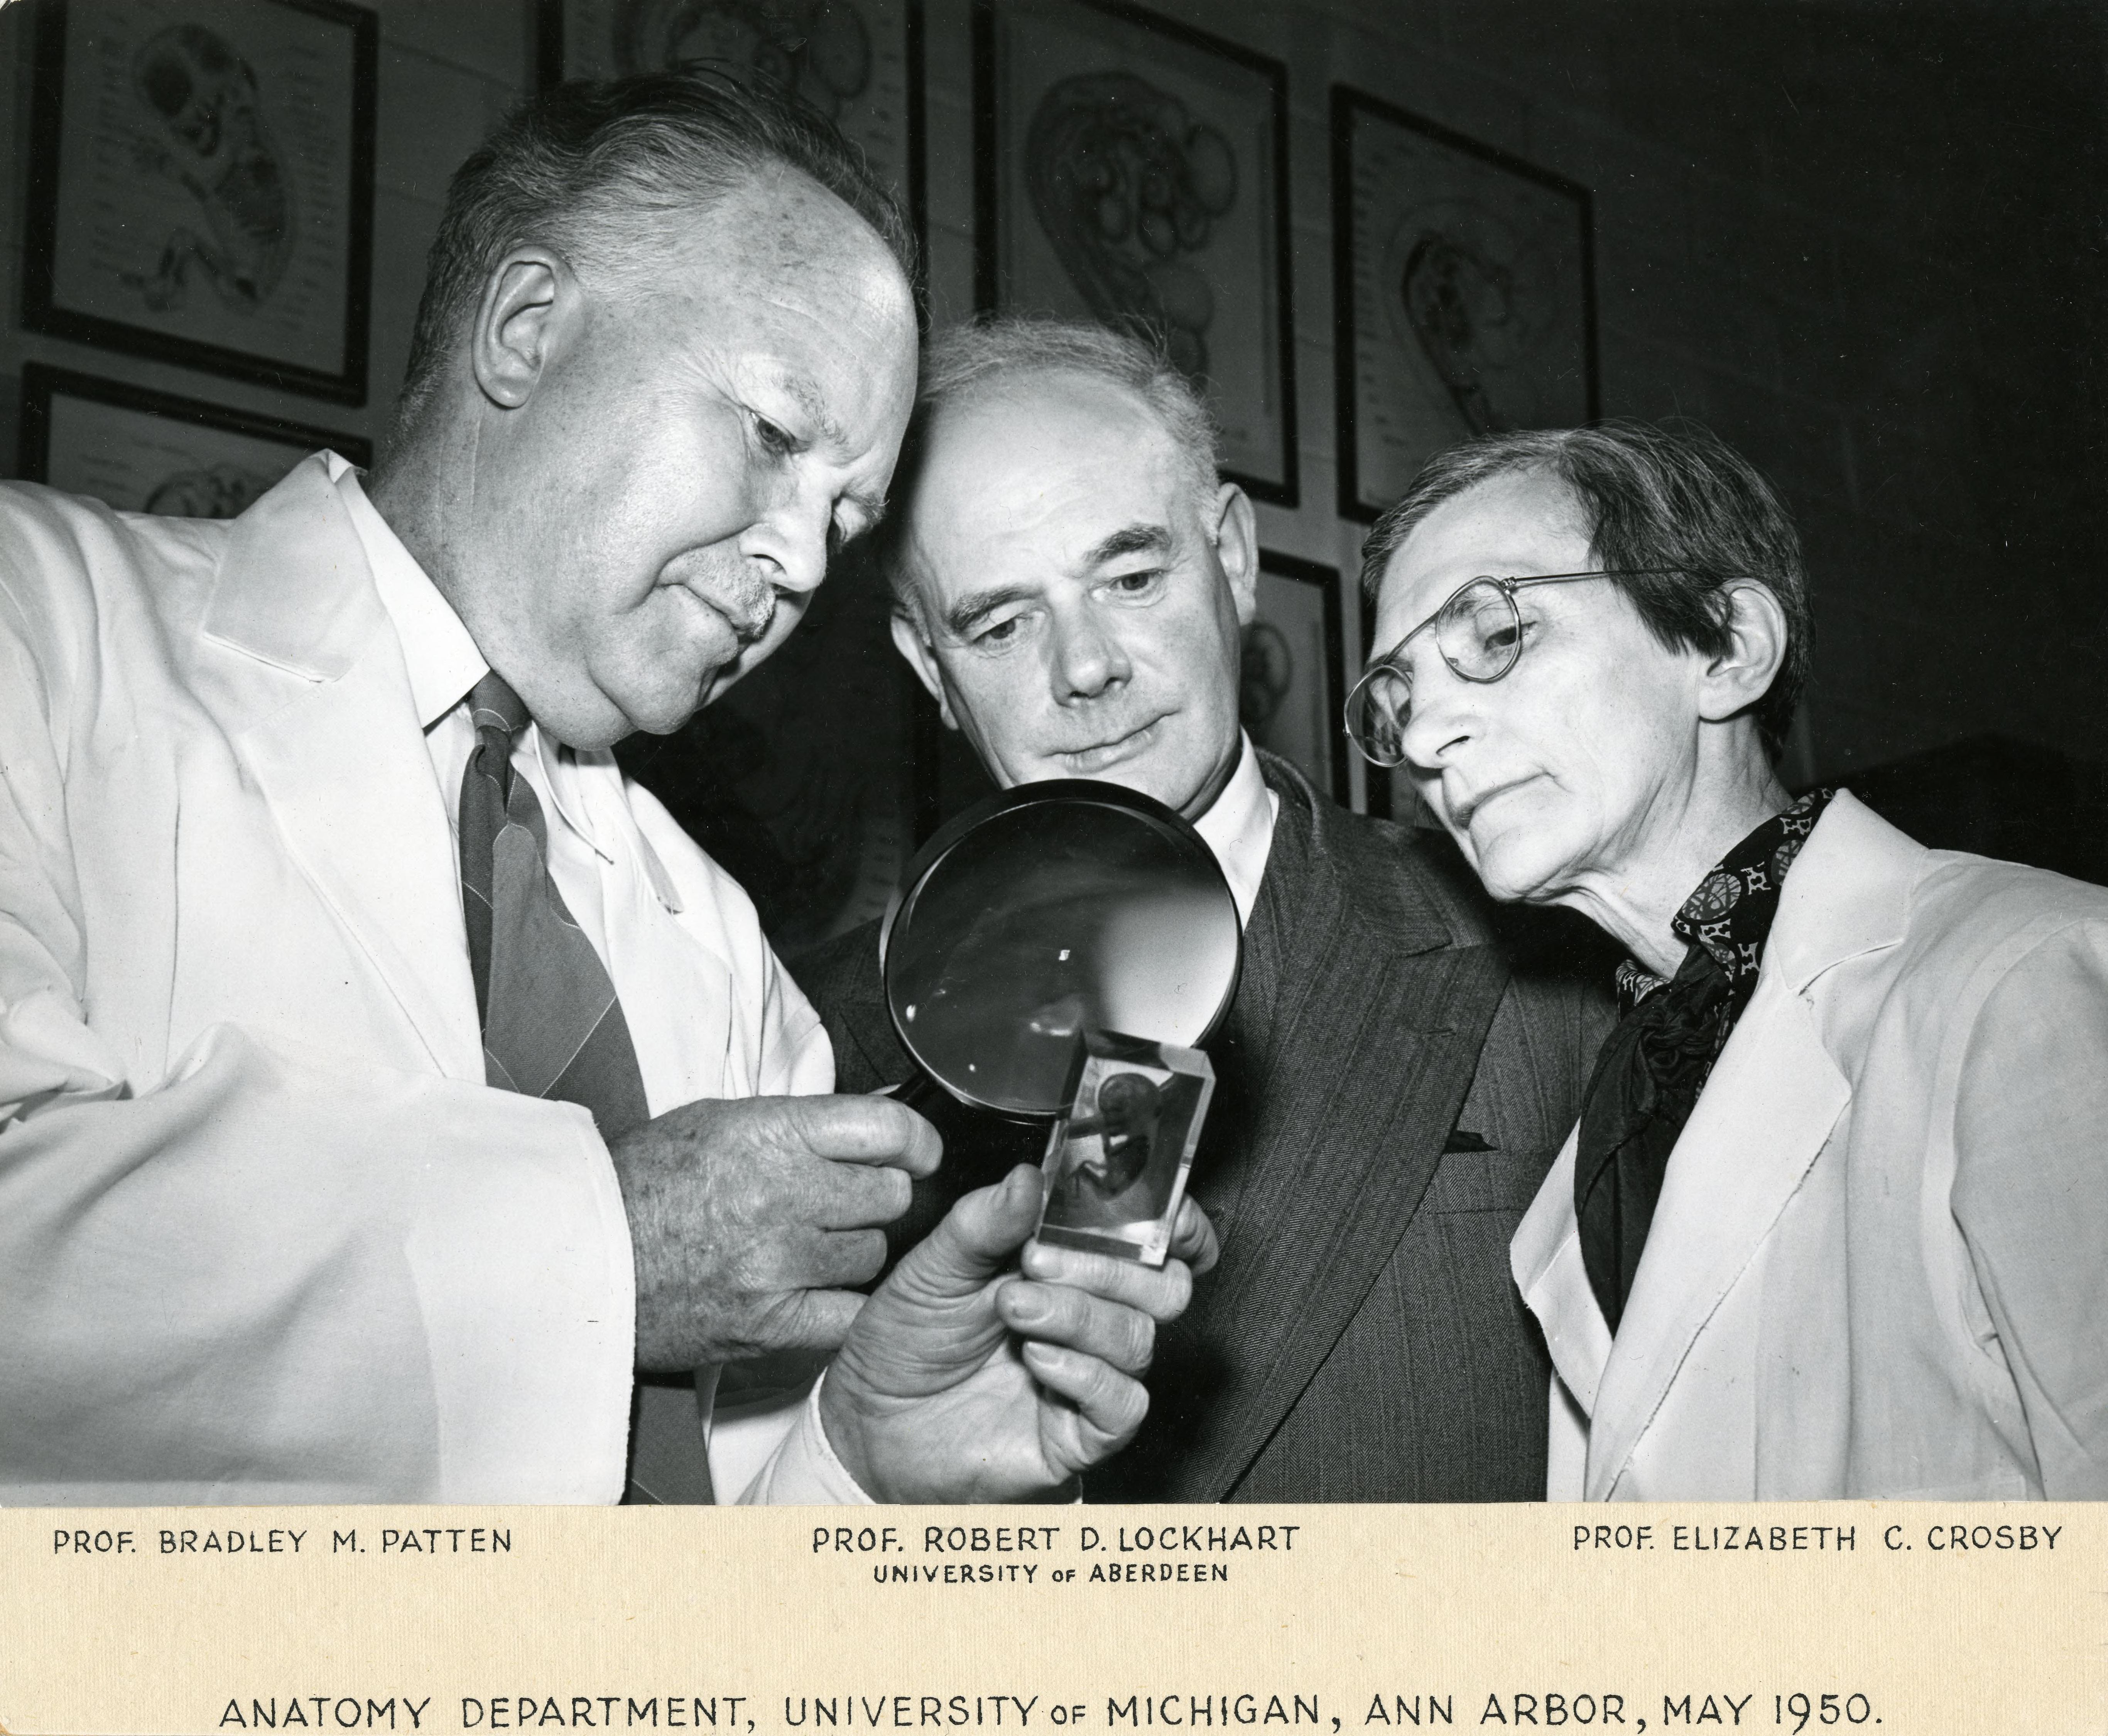 U M Library Image Collection Portfolios 100th Anniversary